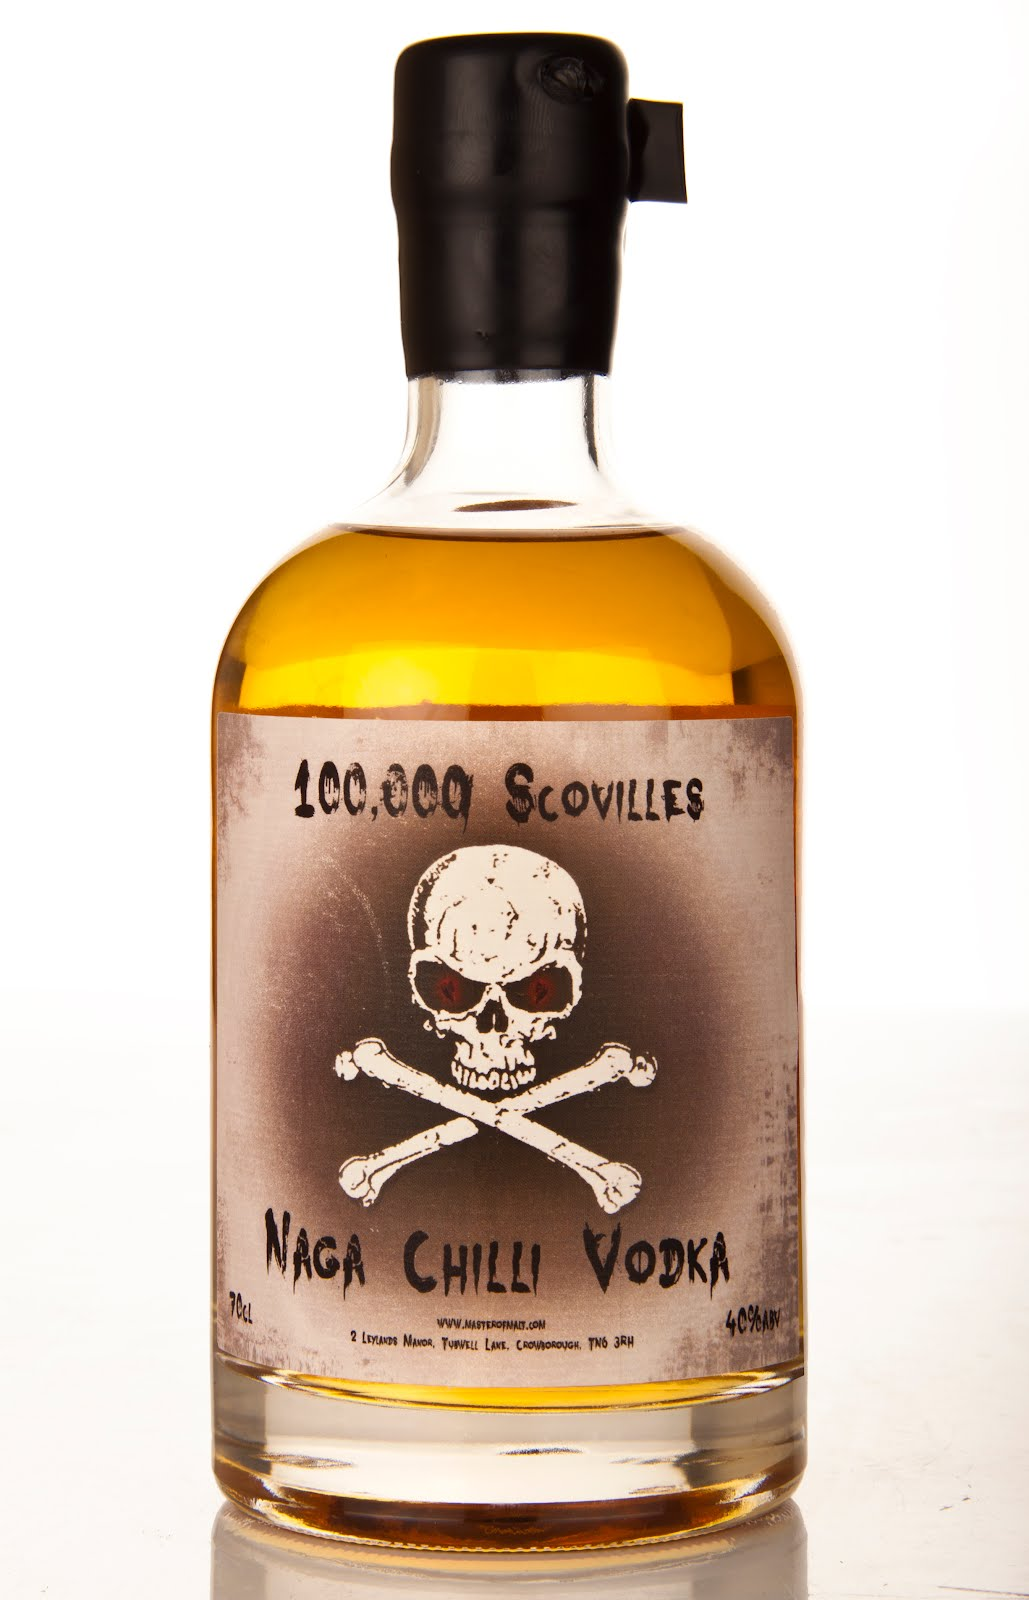 Фото: «100000 Scovilles — Naga Chilli Vodka» — самая острая водка в мире.